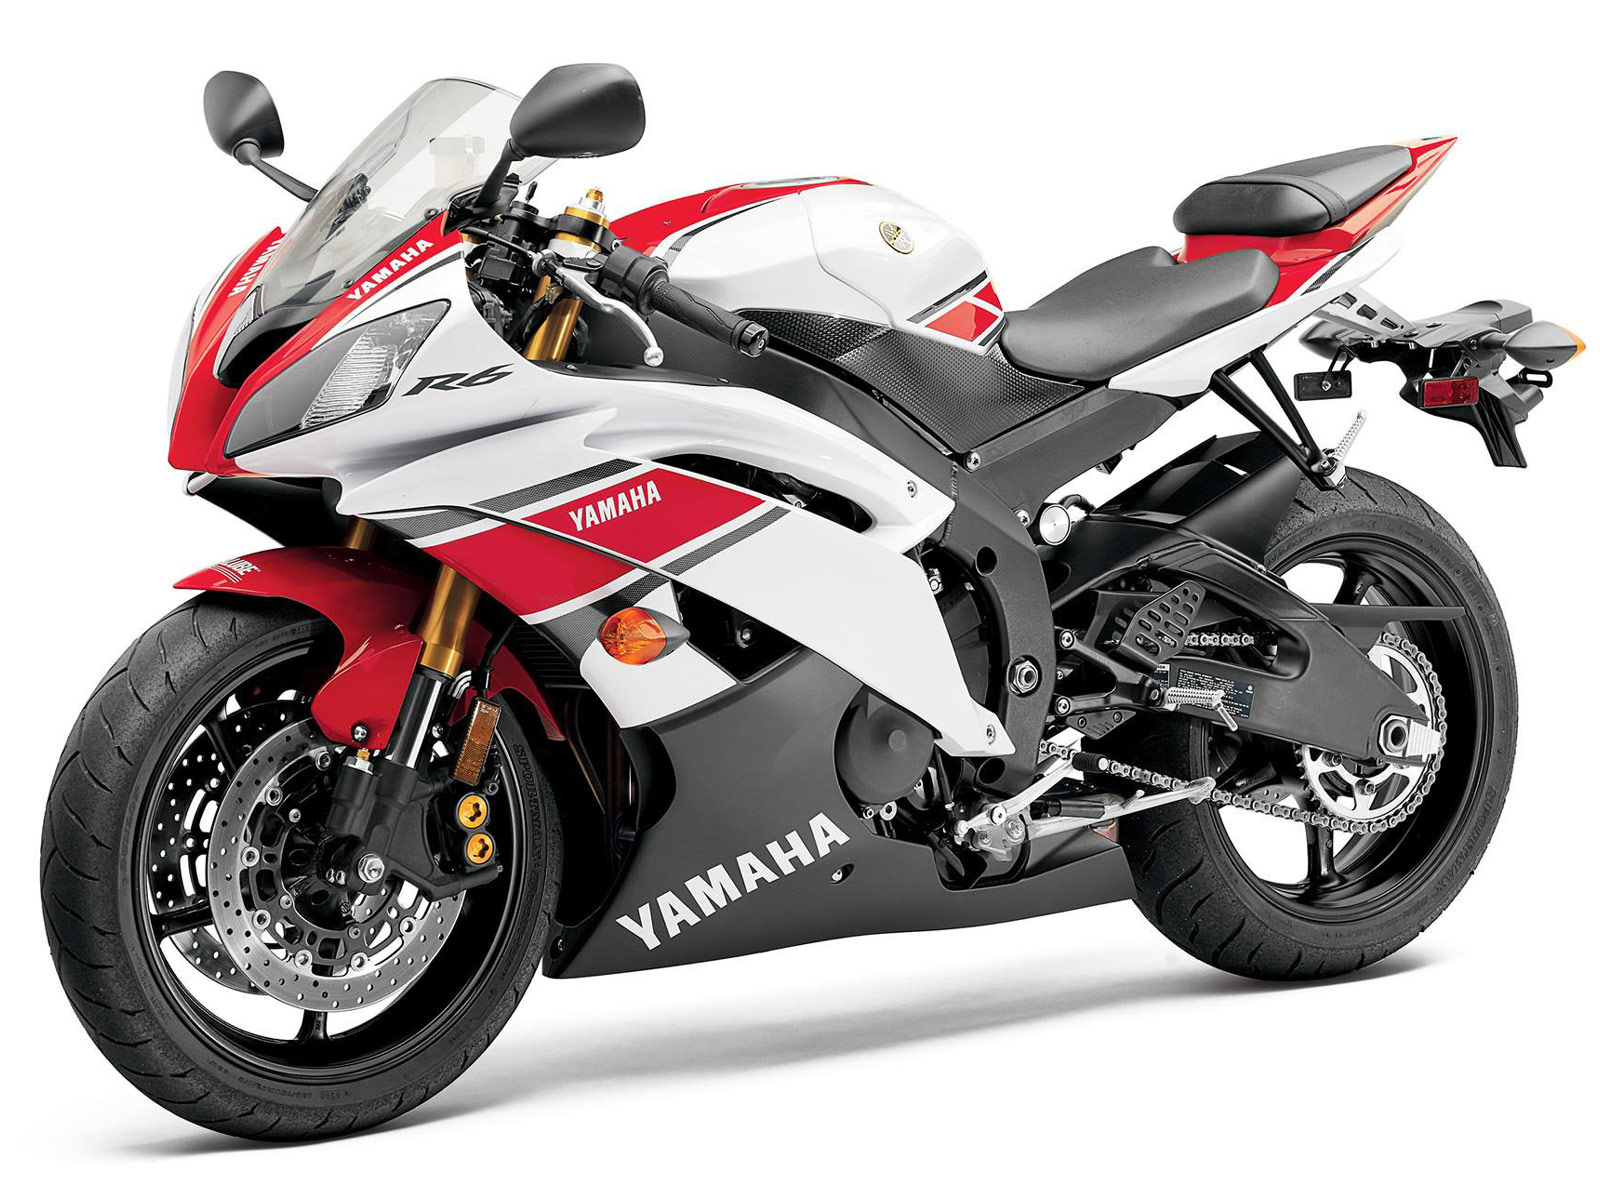 http://2.bp.blogspot.com/-VT4qBjElFwk/TyNKkcVT_9I/AAAAAAAAGnQ/MkivmfYU8YE/s1600/2012-Yamaha-YZF-R6-WorldGP-50th-Anniversary-Edition-motorcycle-desktop-wallpapers-5.jpg